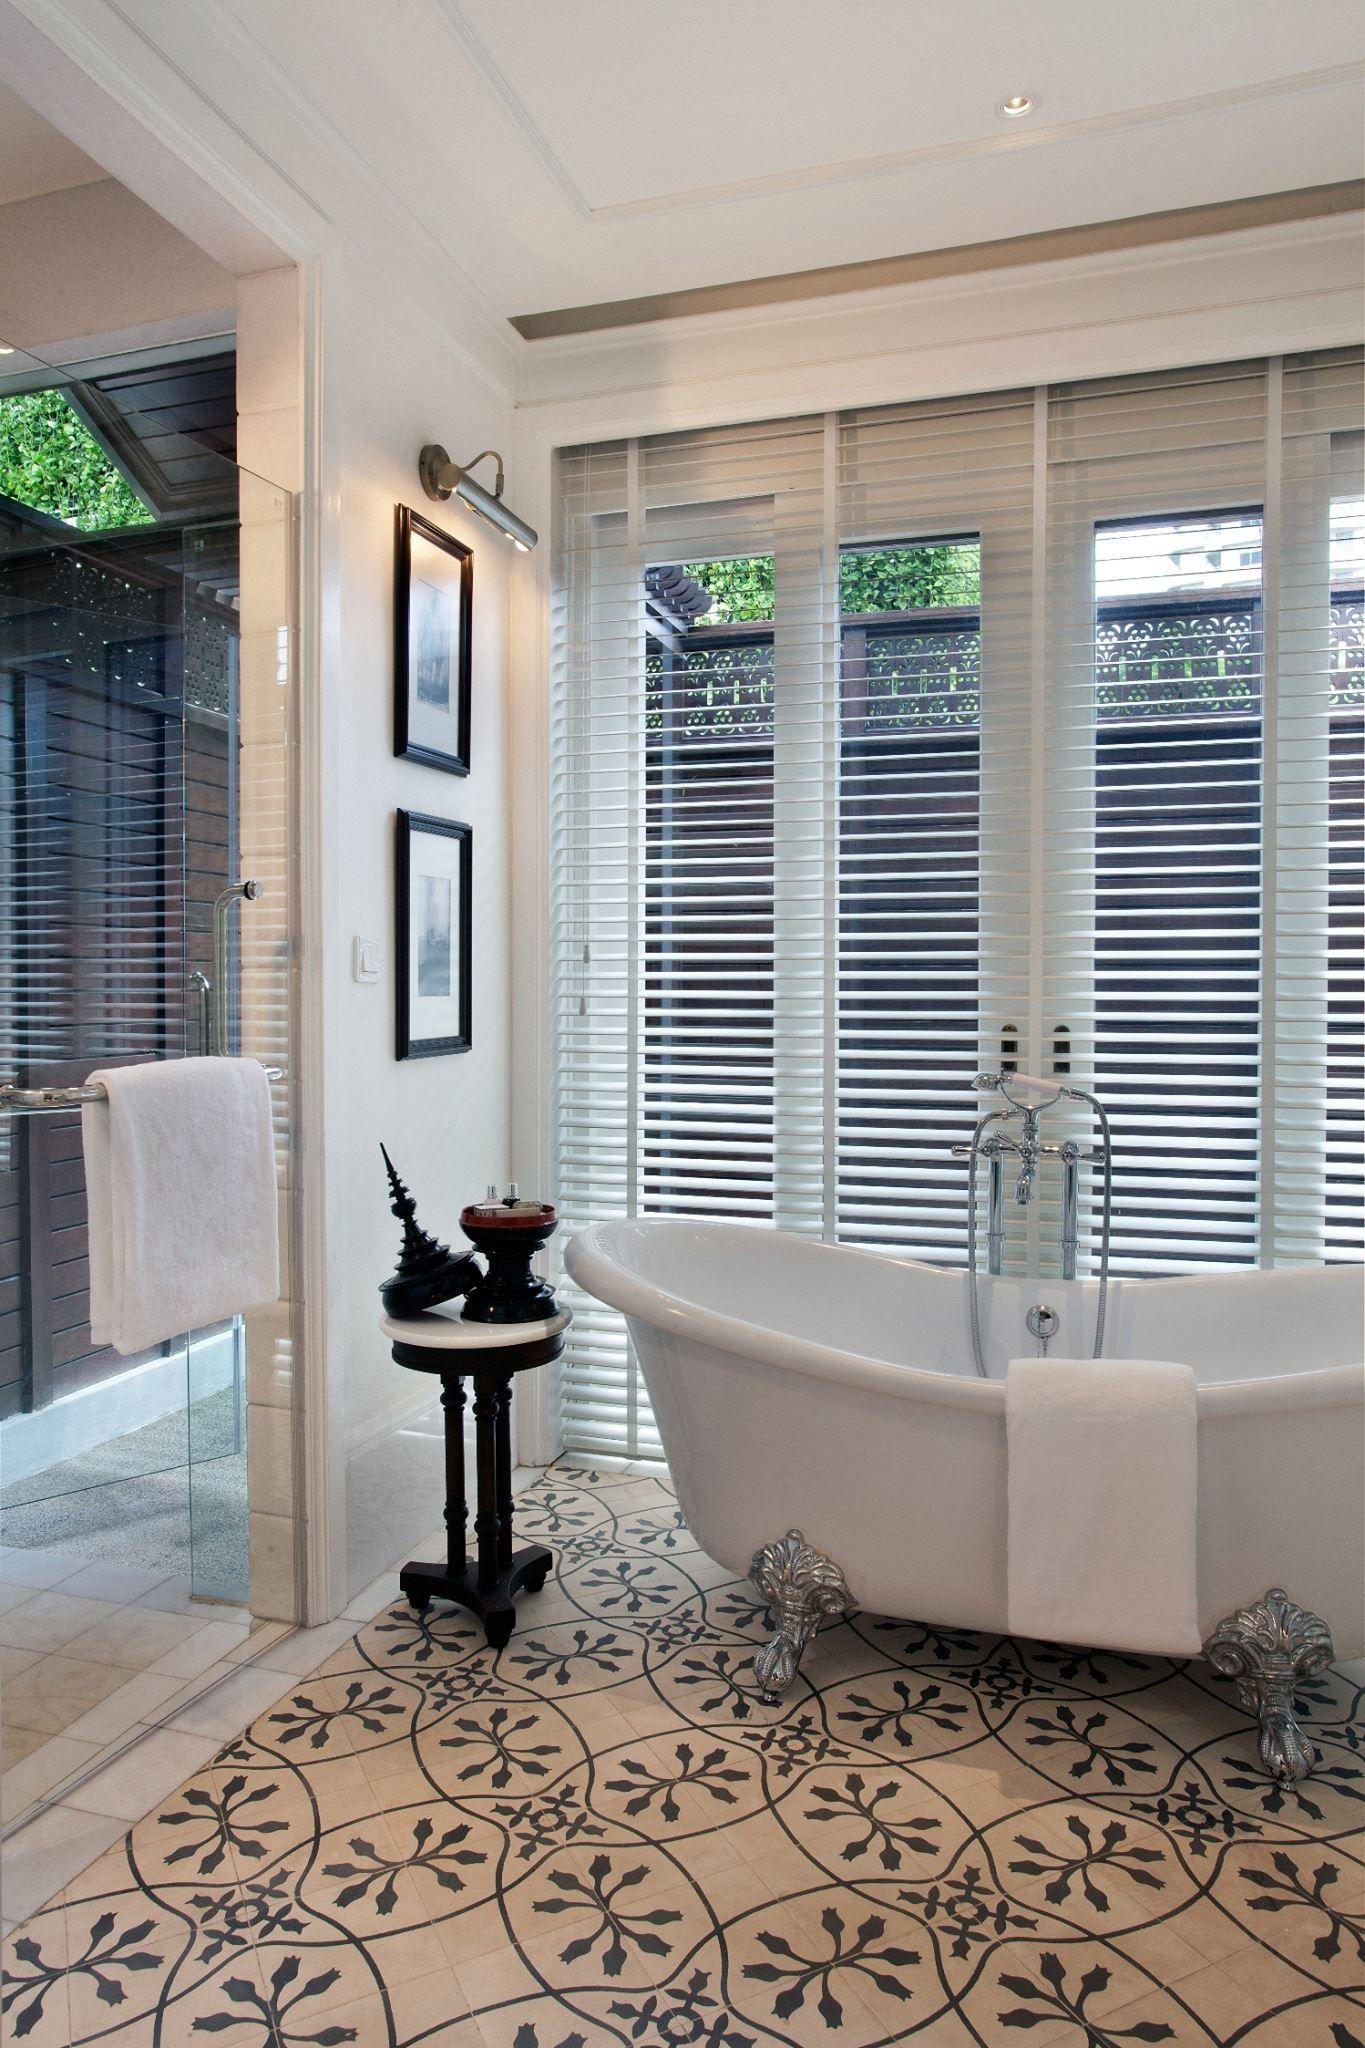 Designinteriores Decorating Homedesign Decor Instadecor Details Style Bathroom Bano Bathroom Decor Living Room Decor Apartment Asian Interior Design British colonial bathroom decor